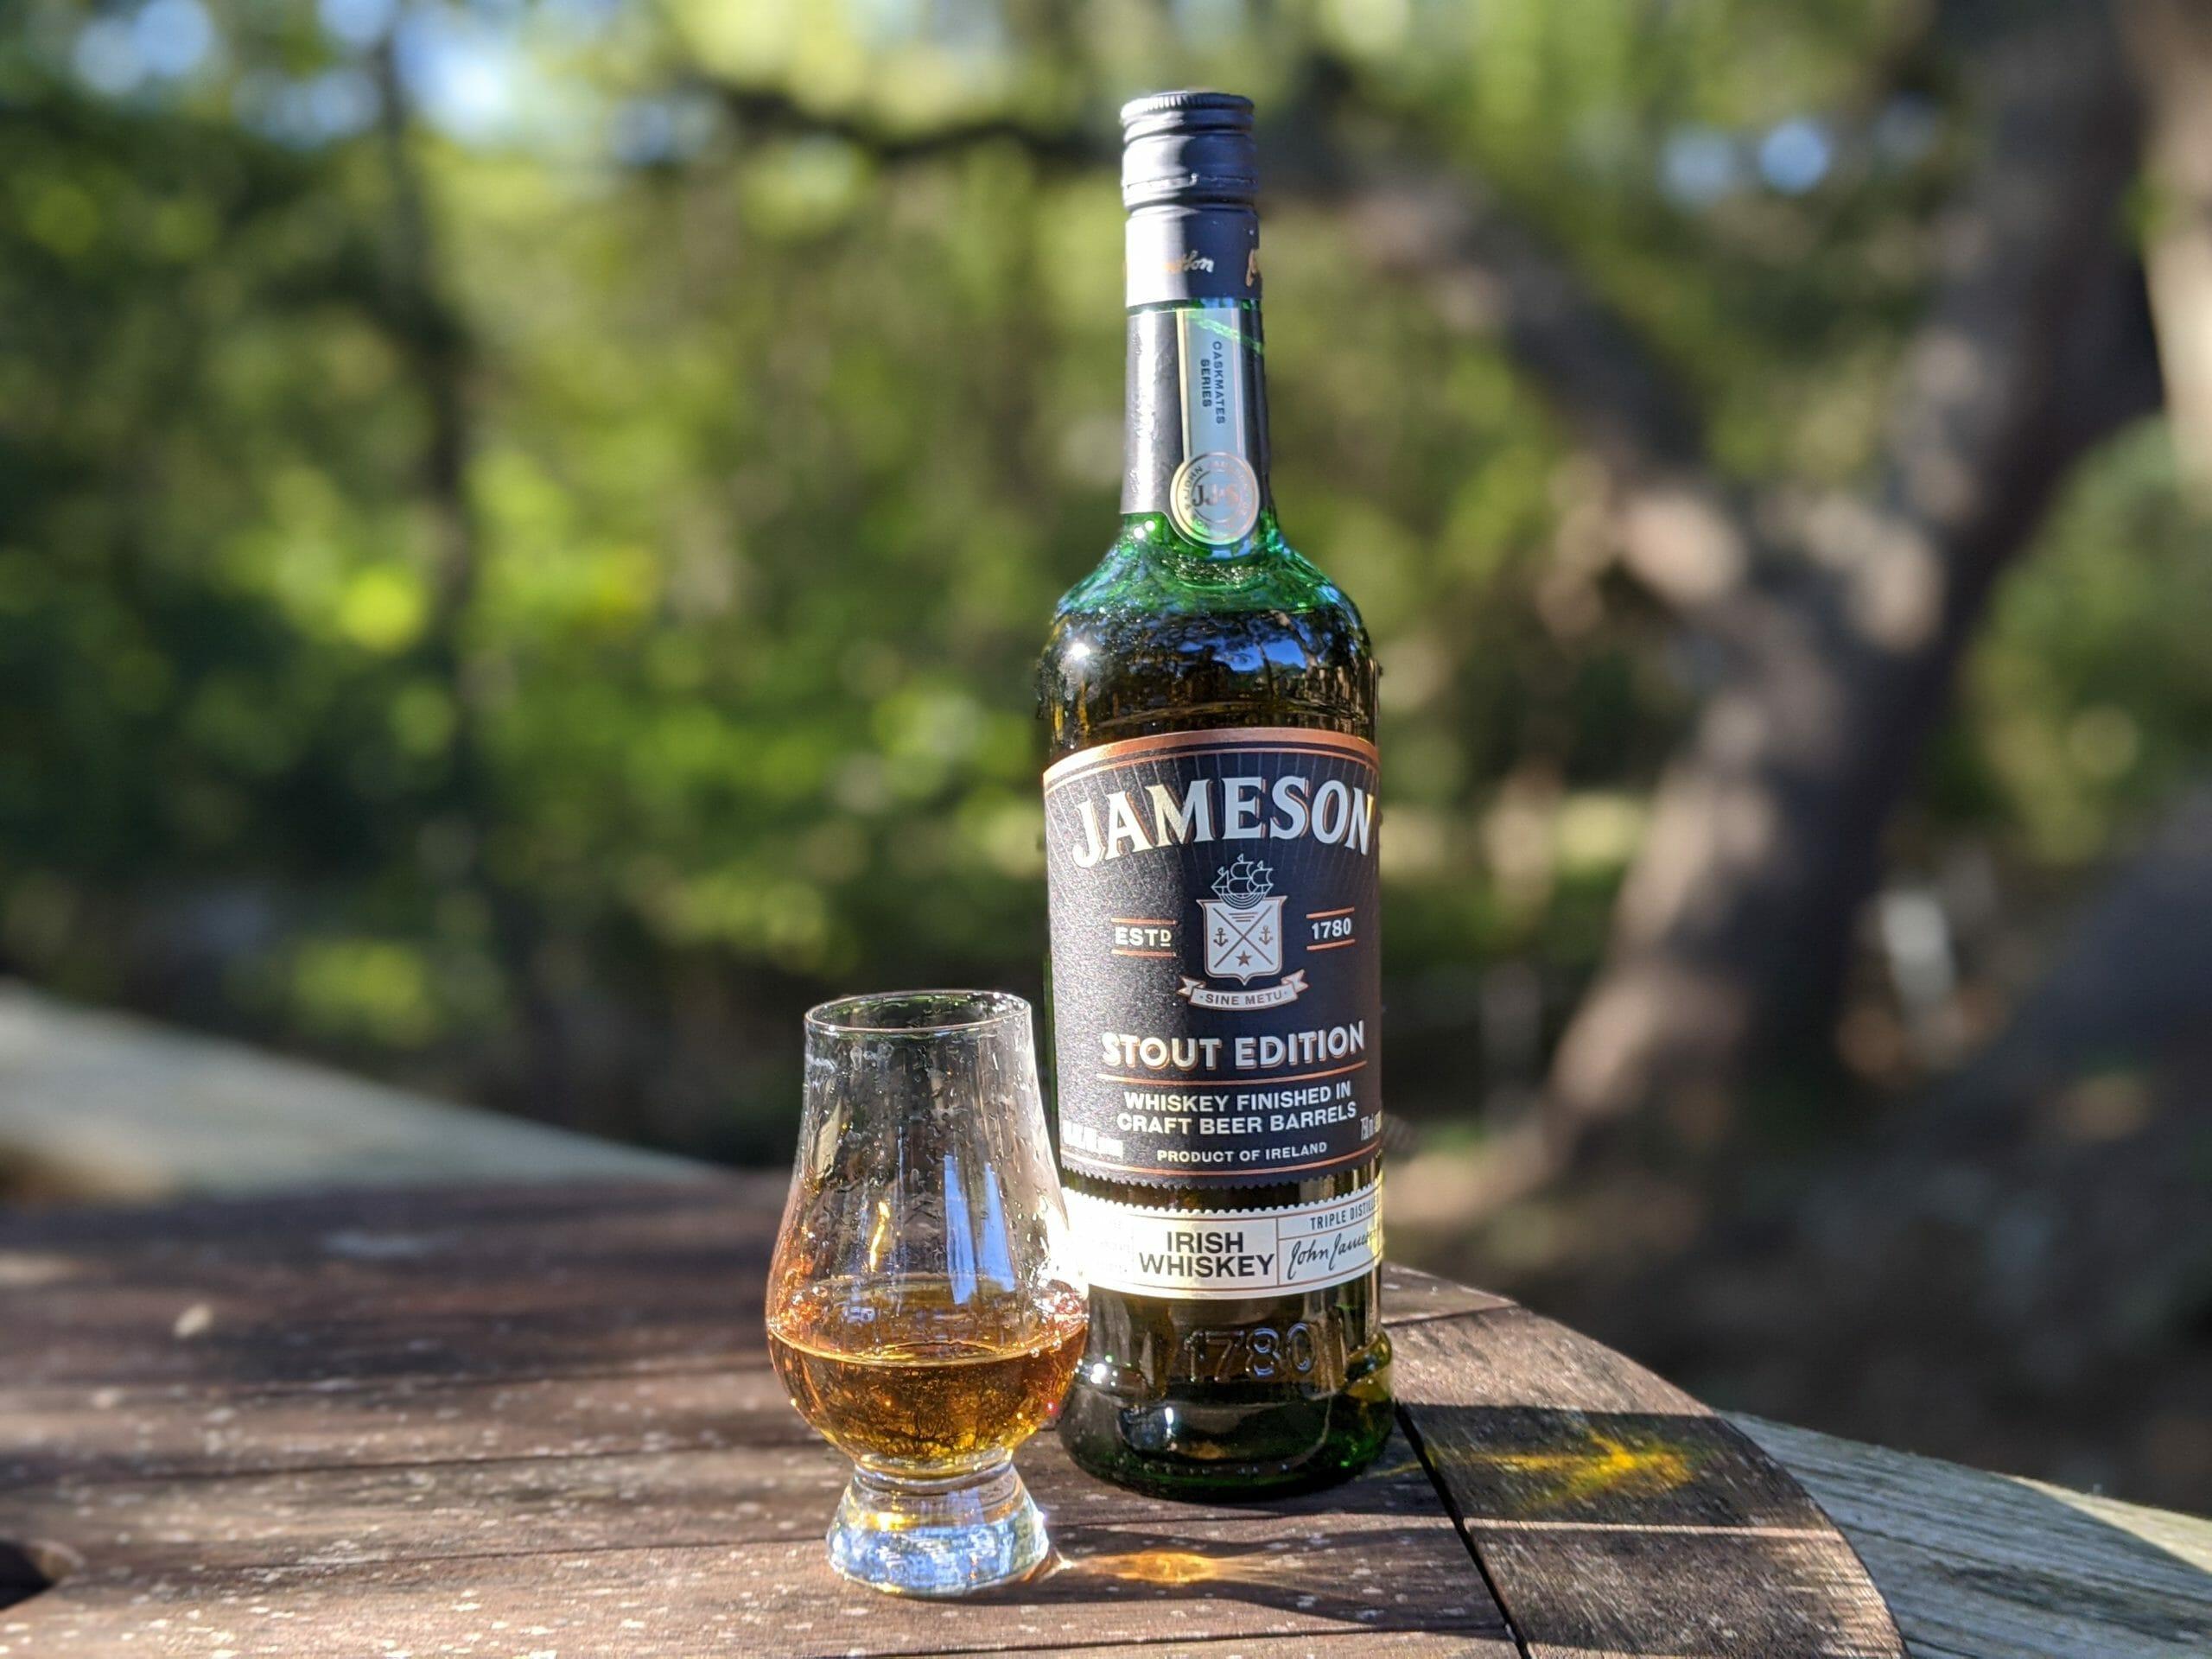 Whiskey Review Jameson Caskmates Stout Edition Blended Irish Whiskey Thirty One Whiskey